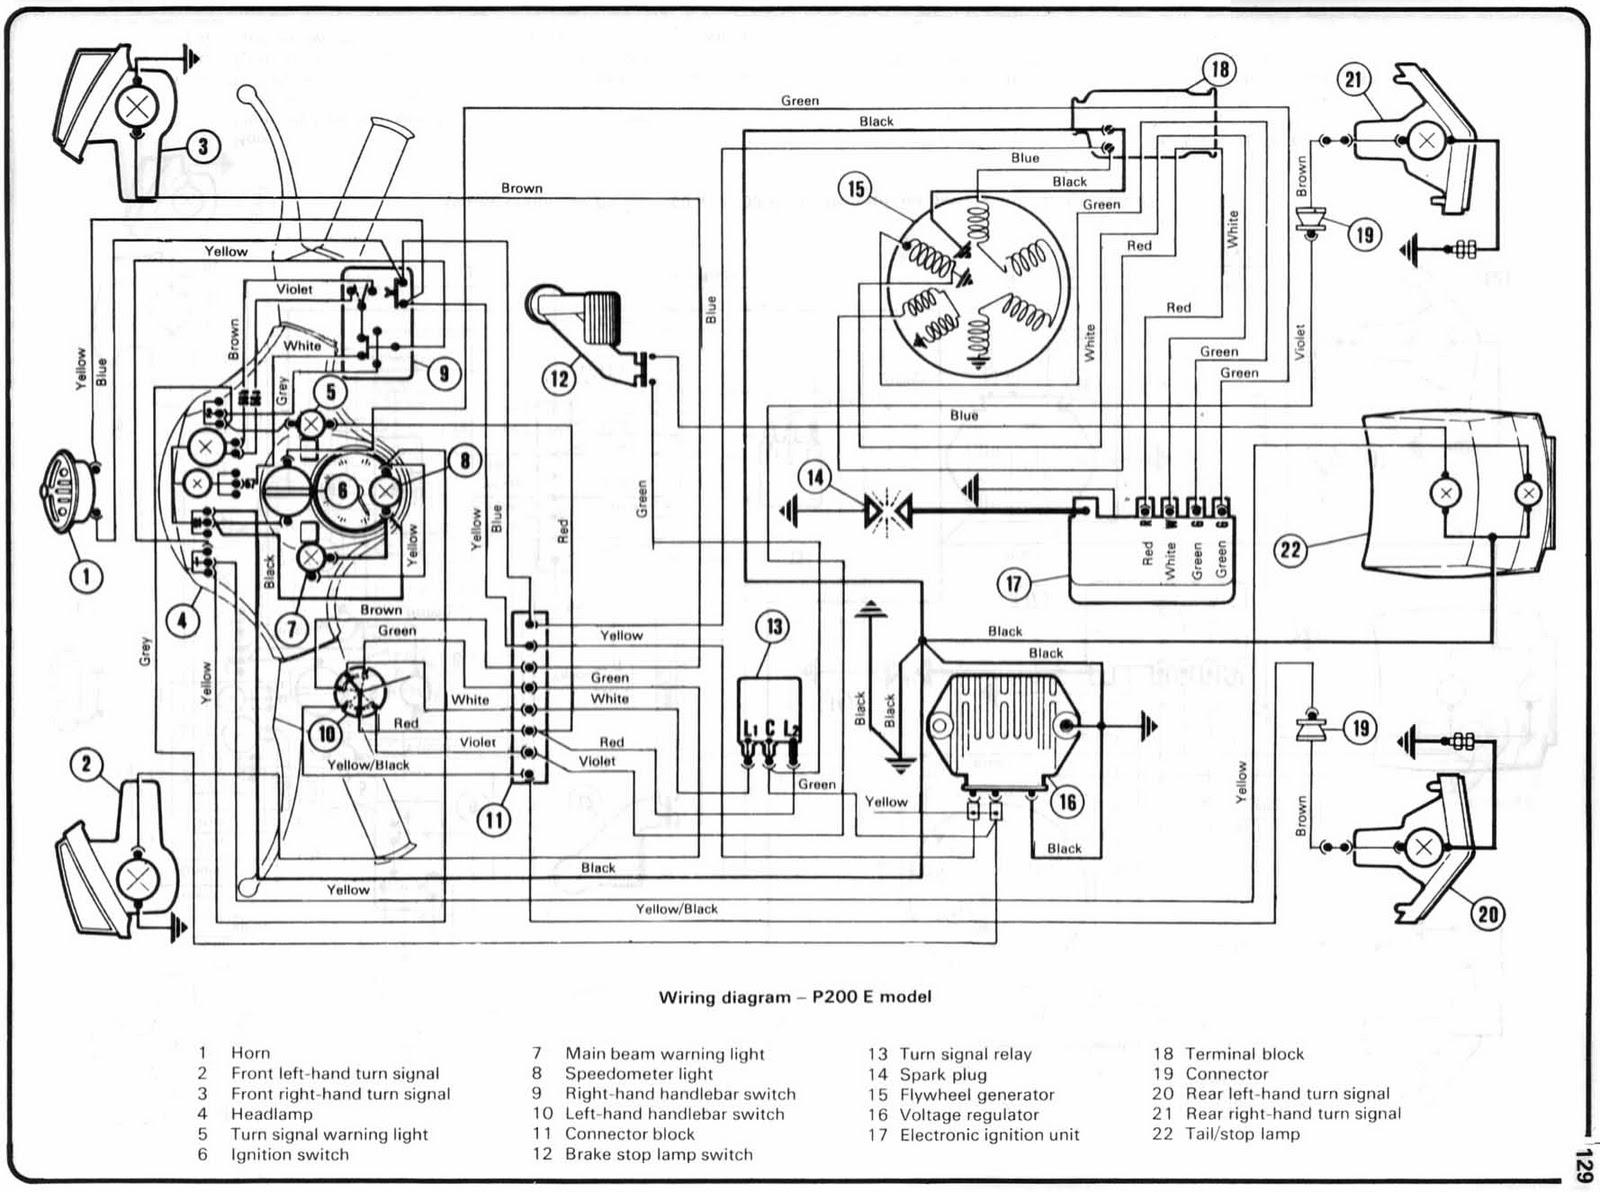 Vespawiringdiagram - Auto Electrical Wiring Diagram on